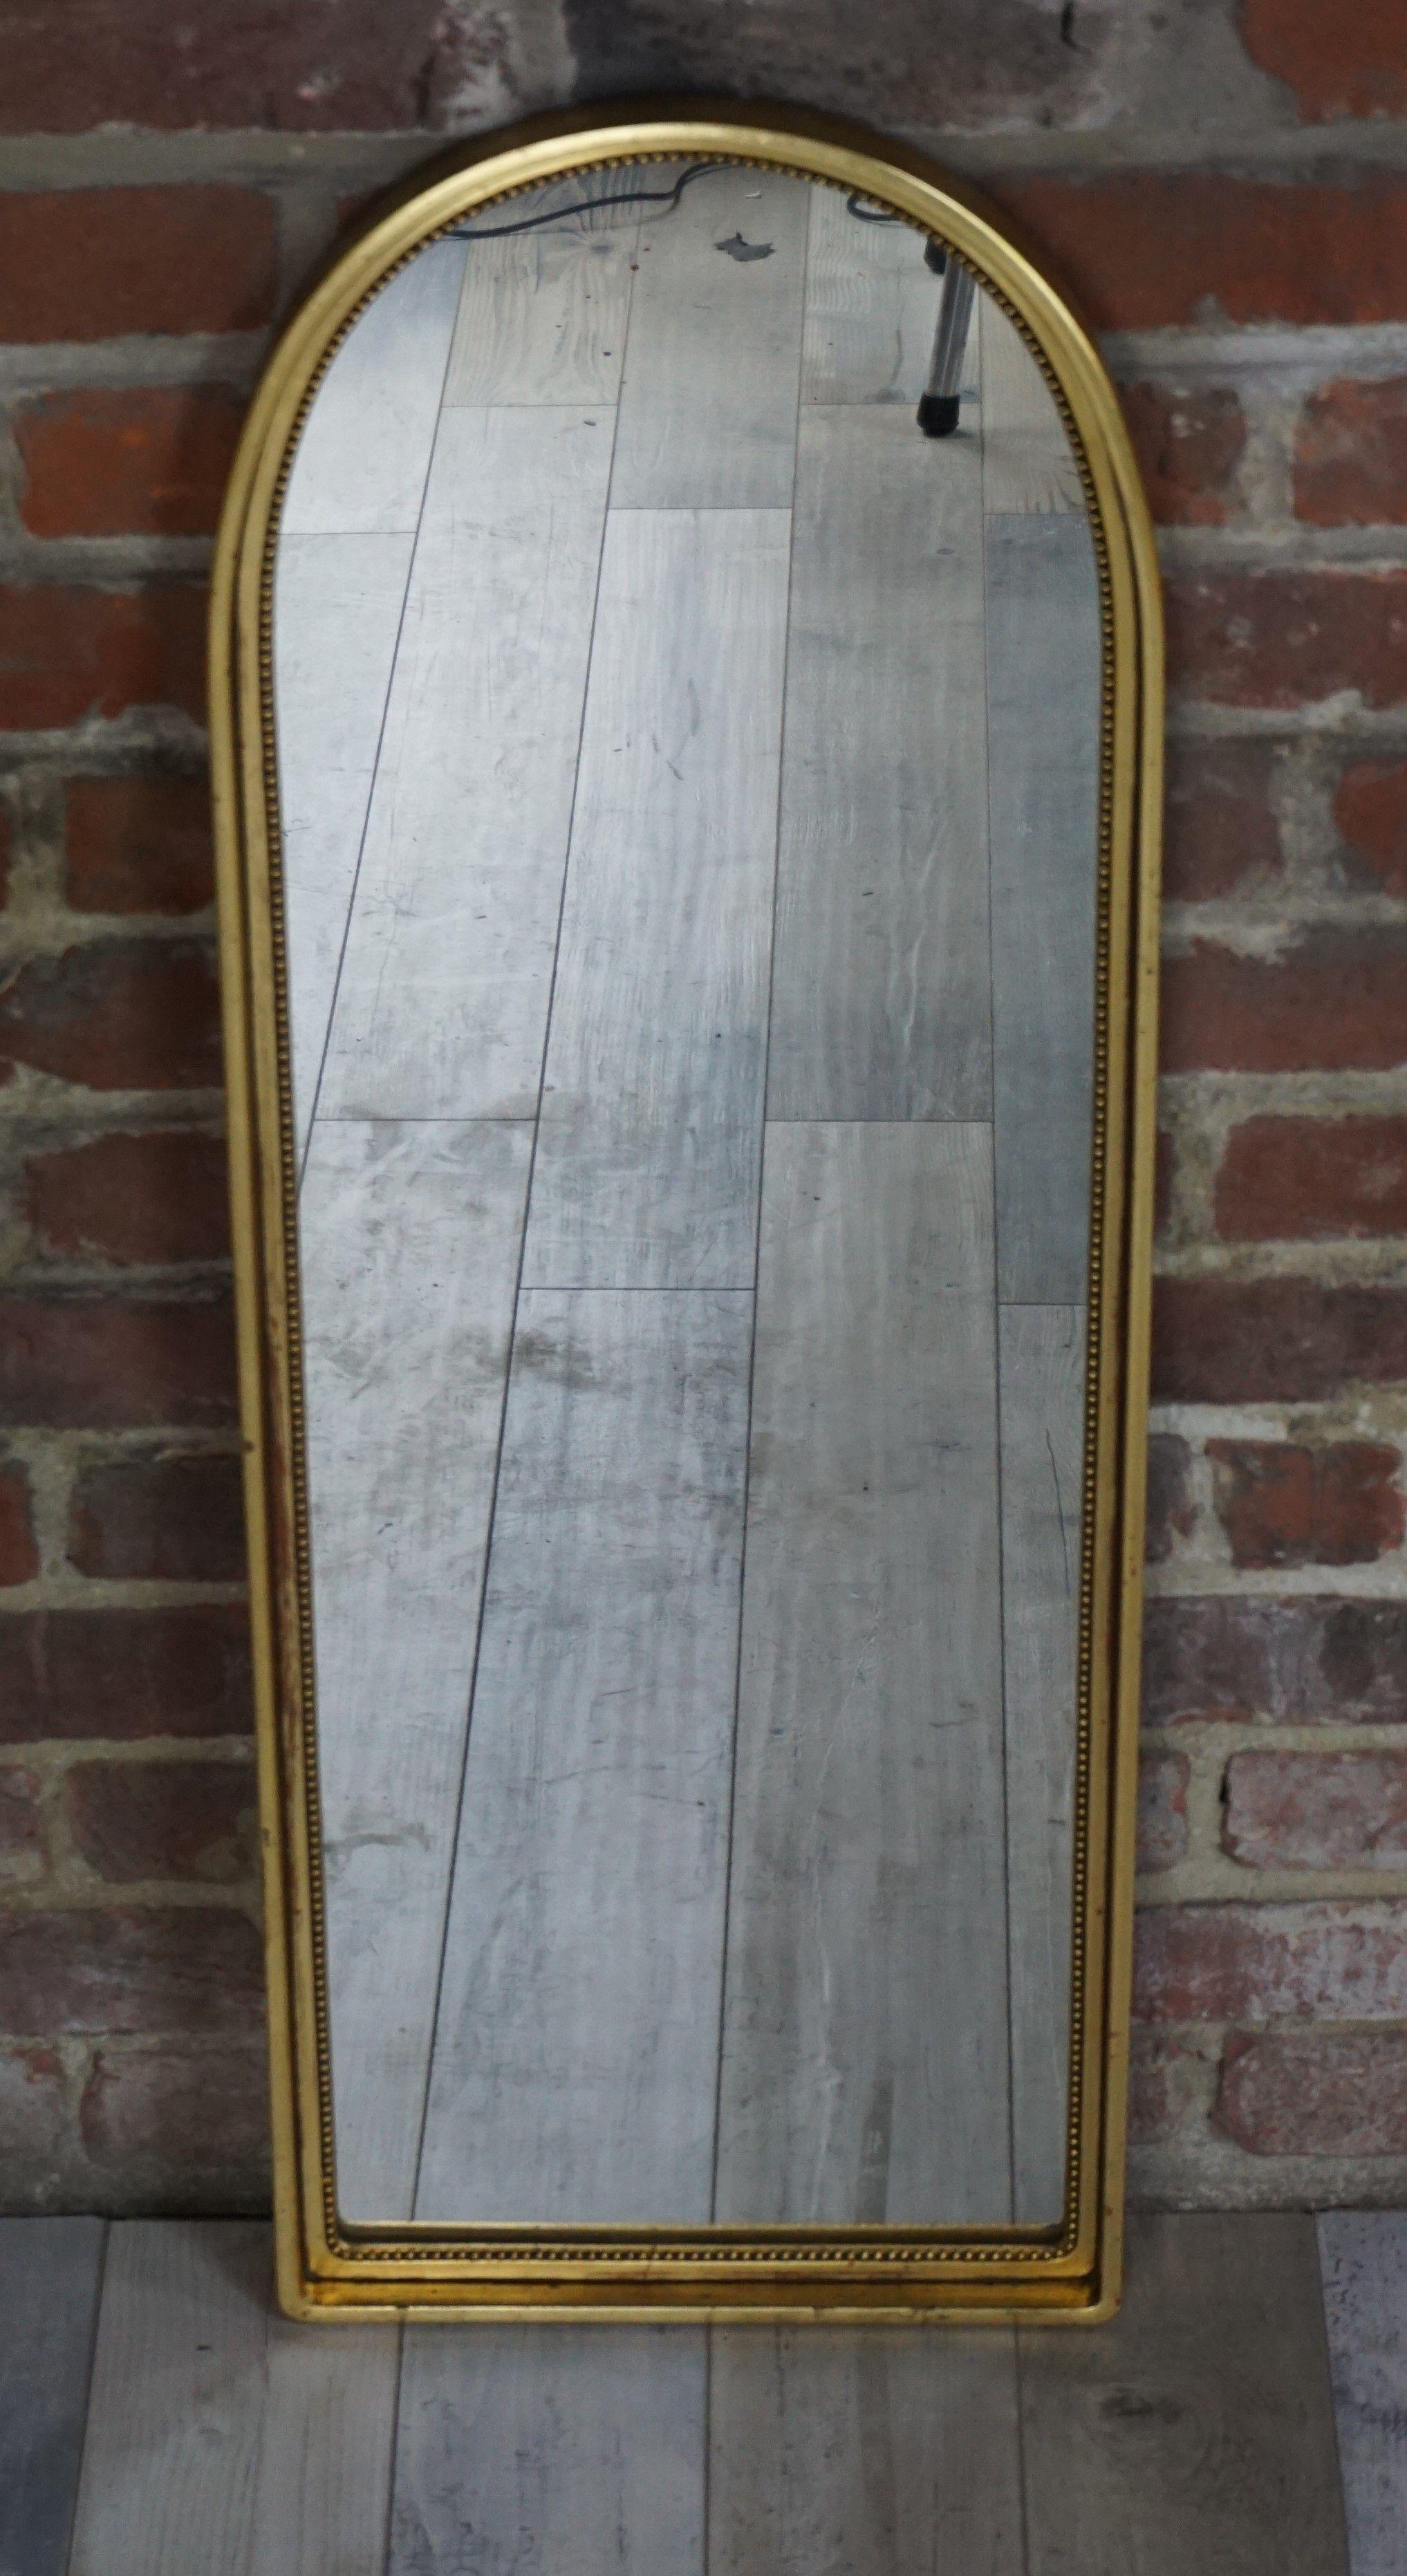 Grand Miroir Ancien En Arcade Miroirs Anciens Grand Miroir Miroir